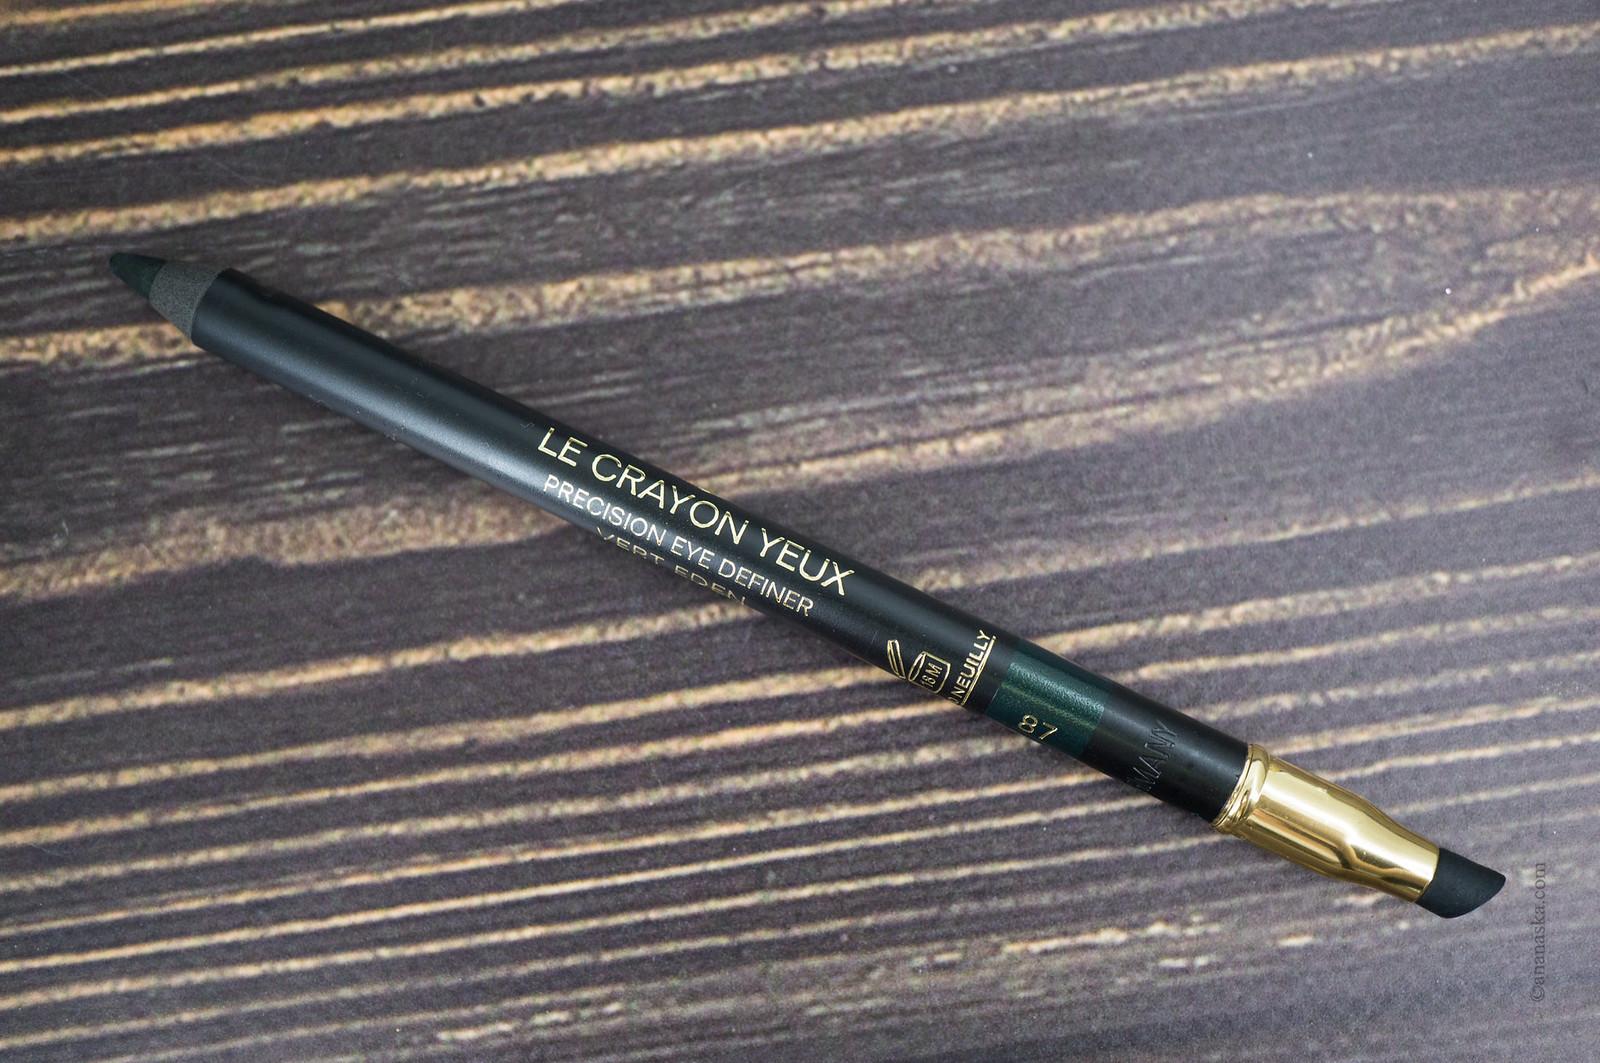 Chanel Le Crayon Yeux 87 Vert Eden